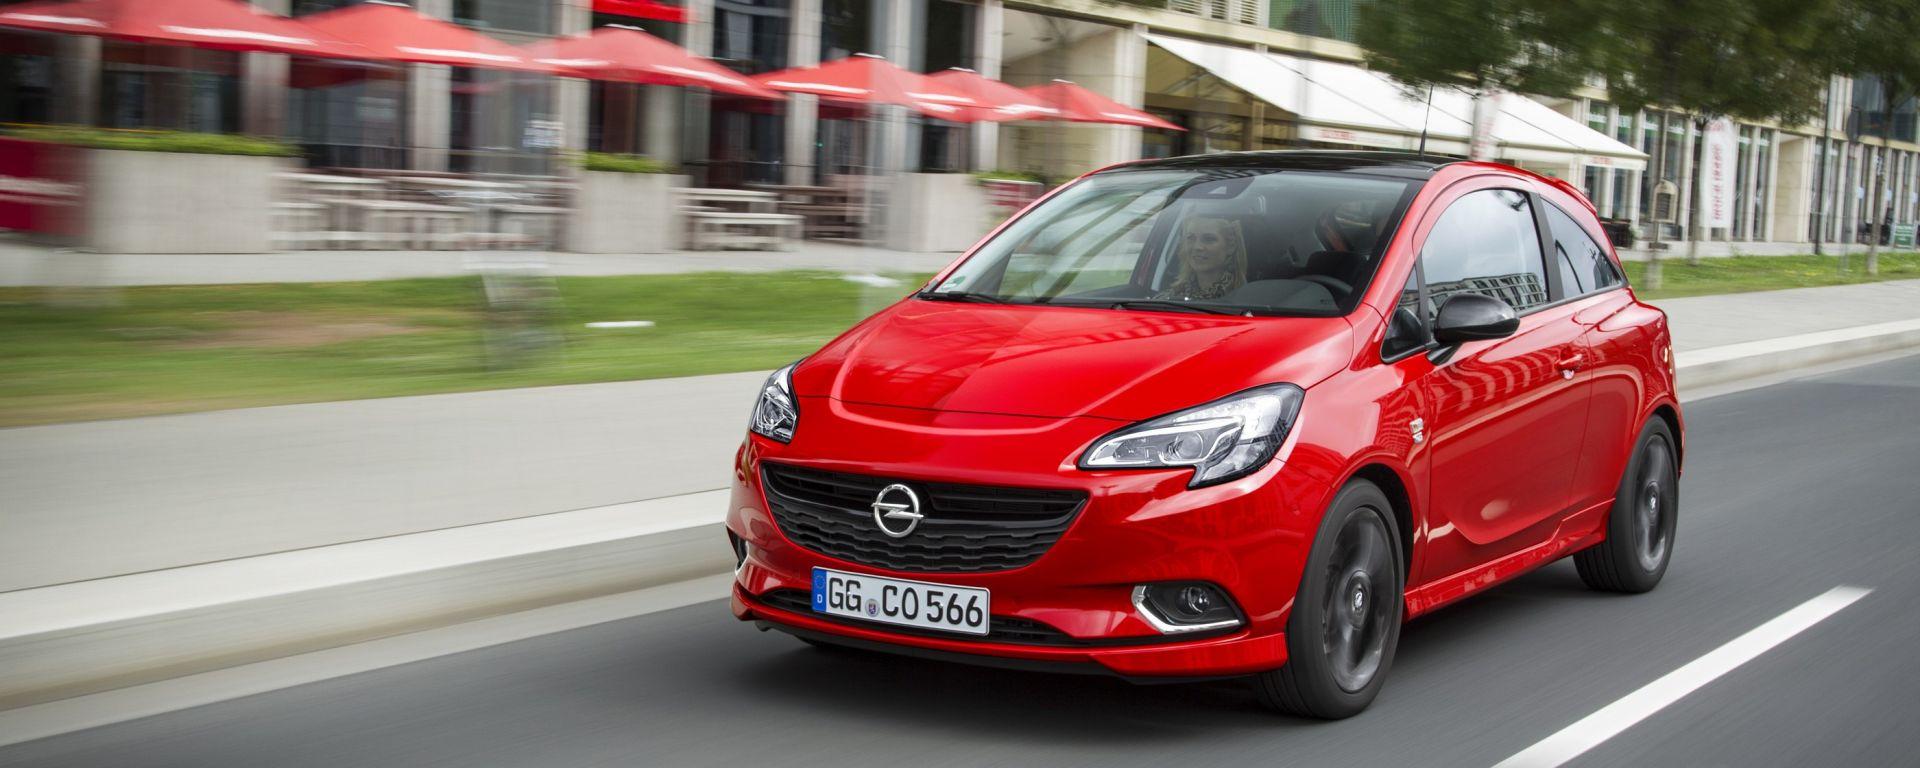 Opel Corsa 1.0 Turbo 115 cv b-Color